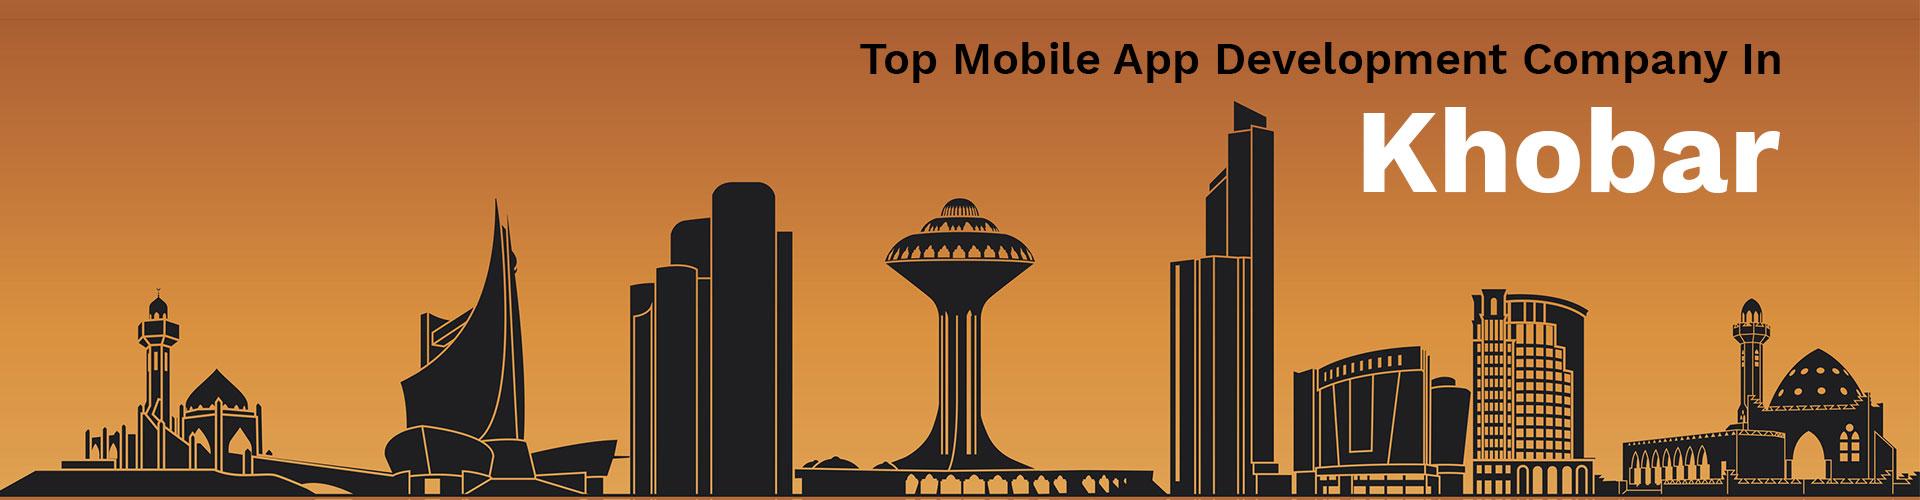 mobile app development company khobar